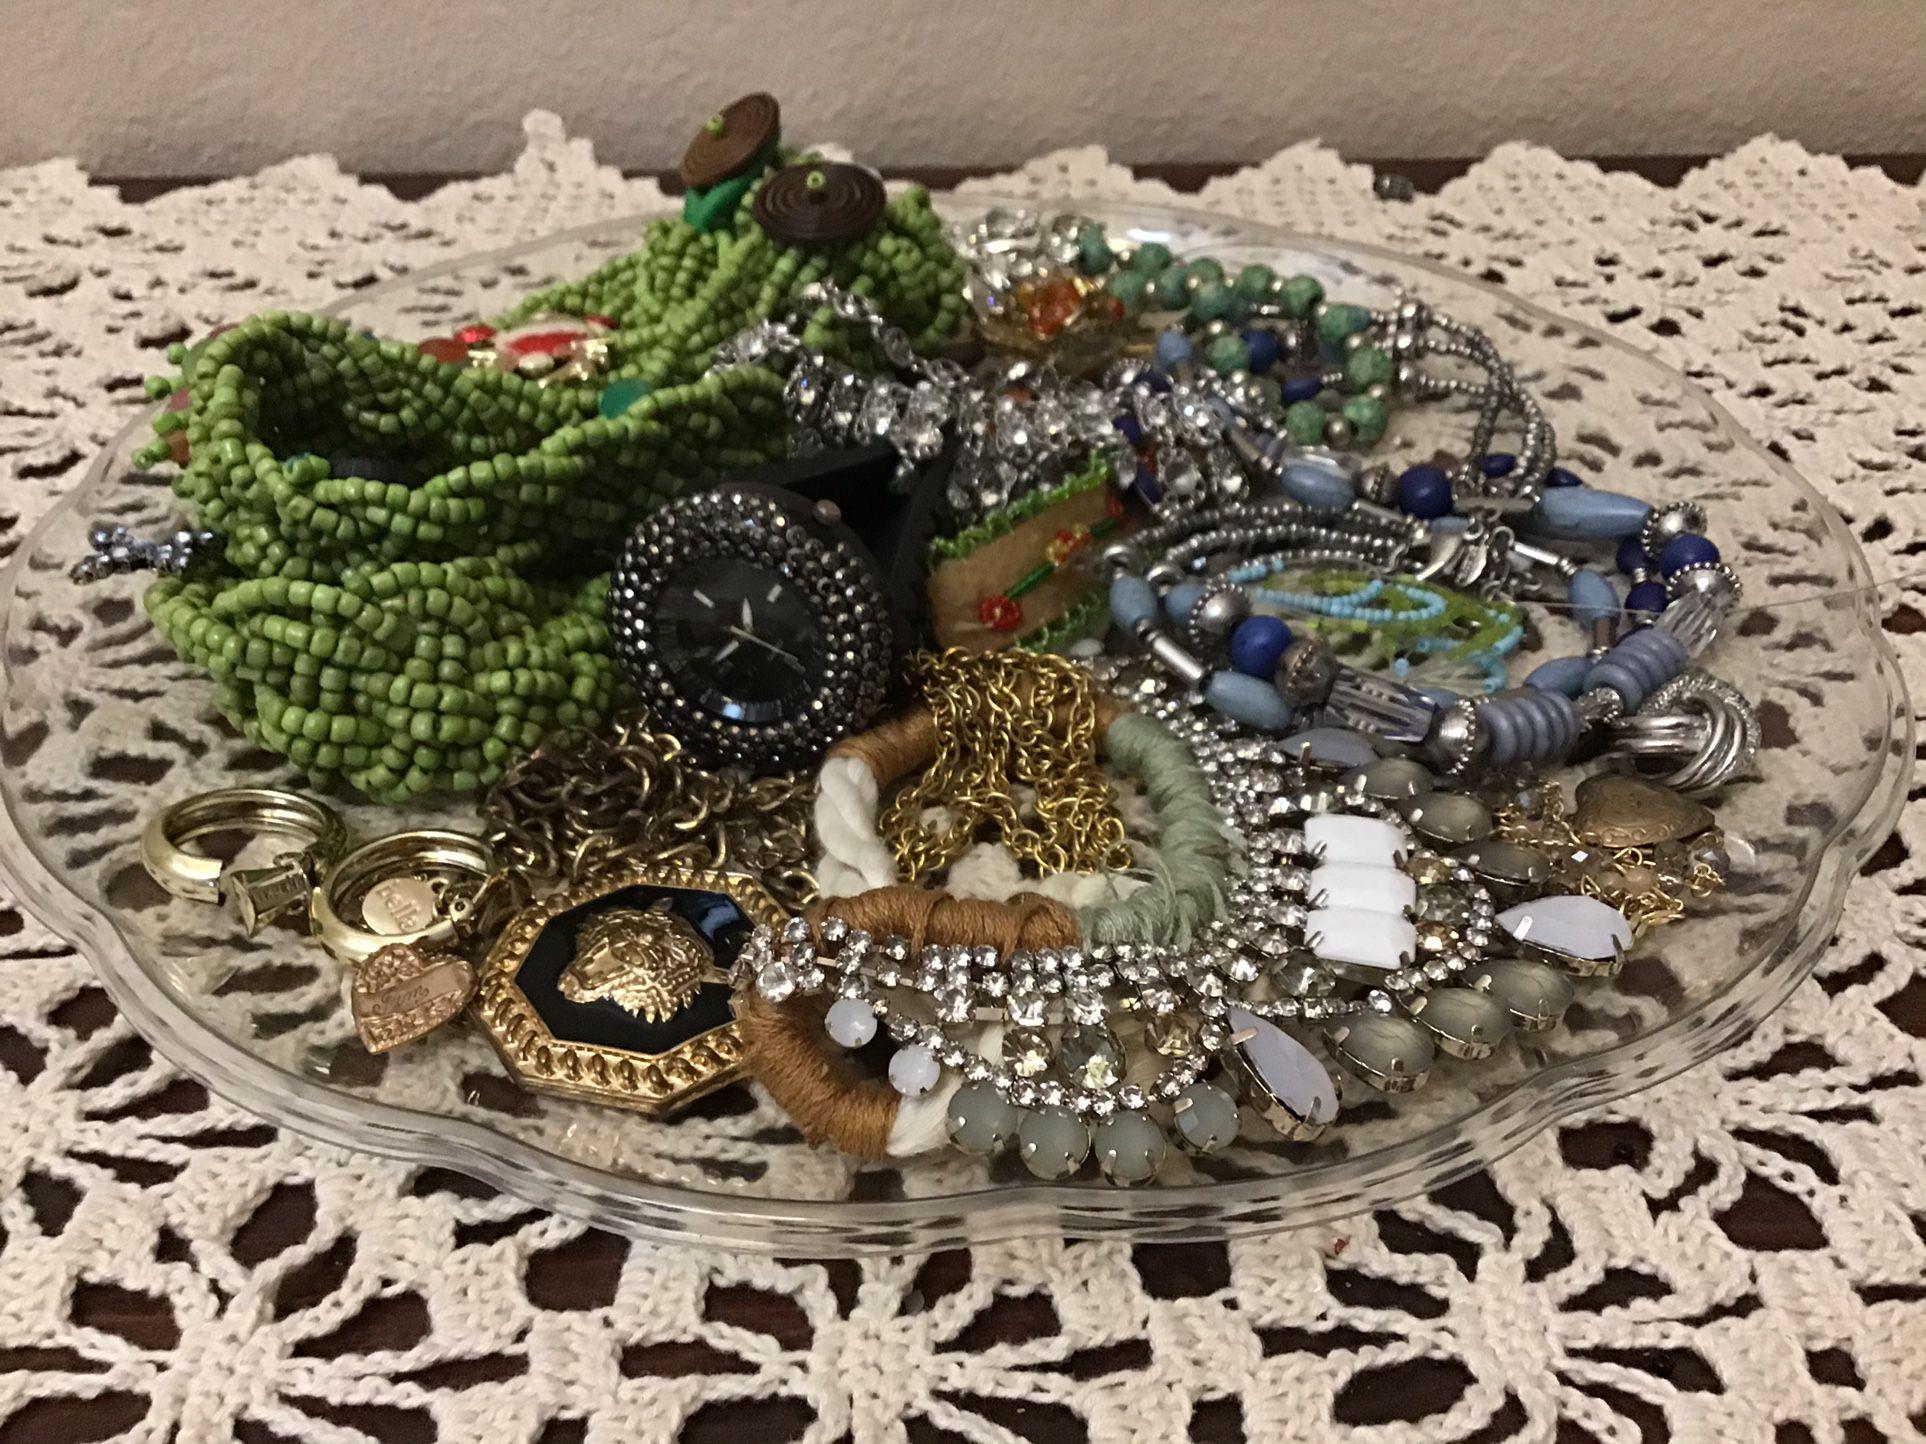 1 Lb 10.2 oz of Broken and Incomplete Vintage & Modern Jewelry for Repair or Arts & Crafts / Joyas Rotas o Incompletas para Arte y Manualidades